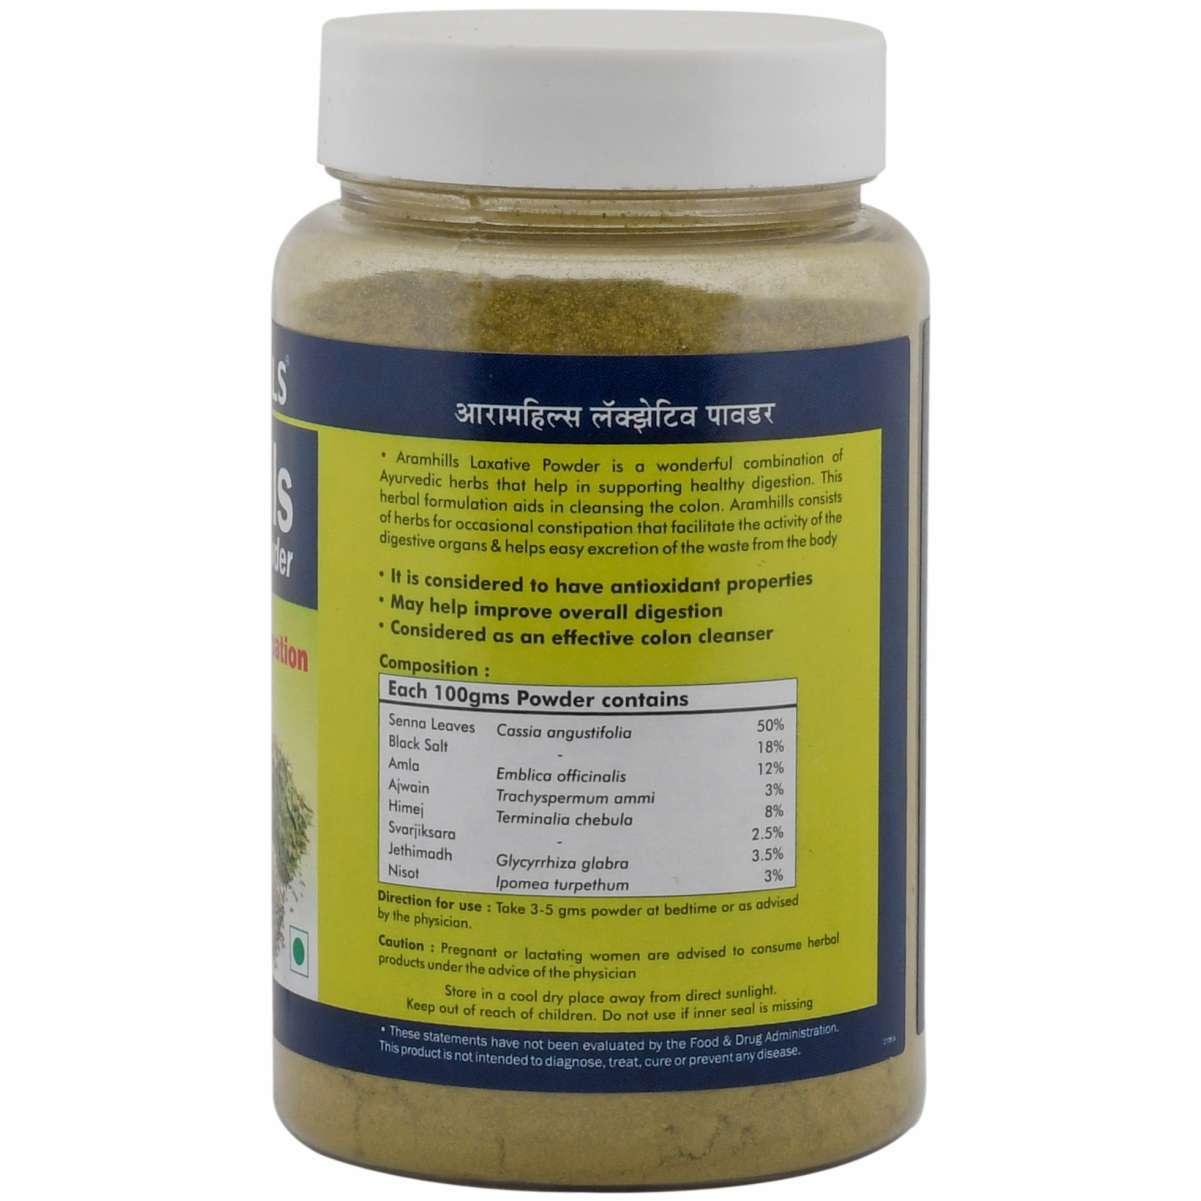 Digestive Support Supplement - Aramhills Laxative Powder